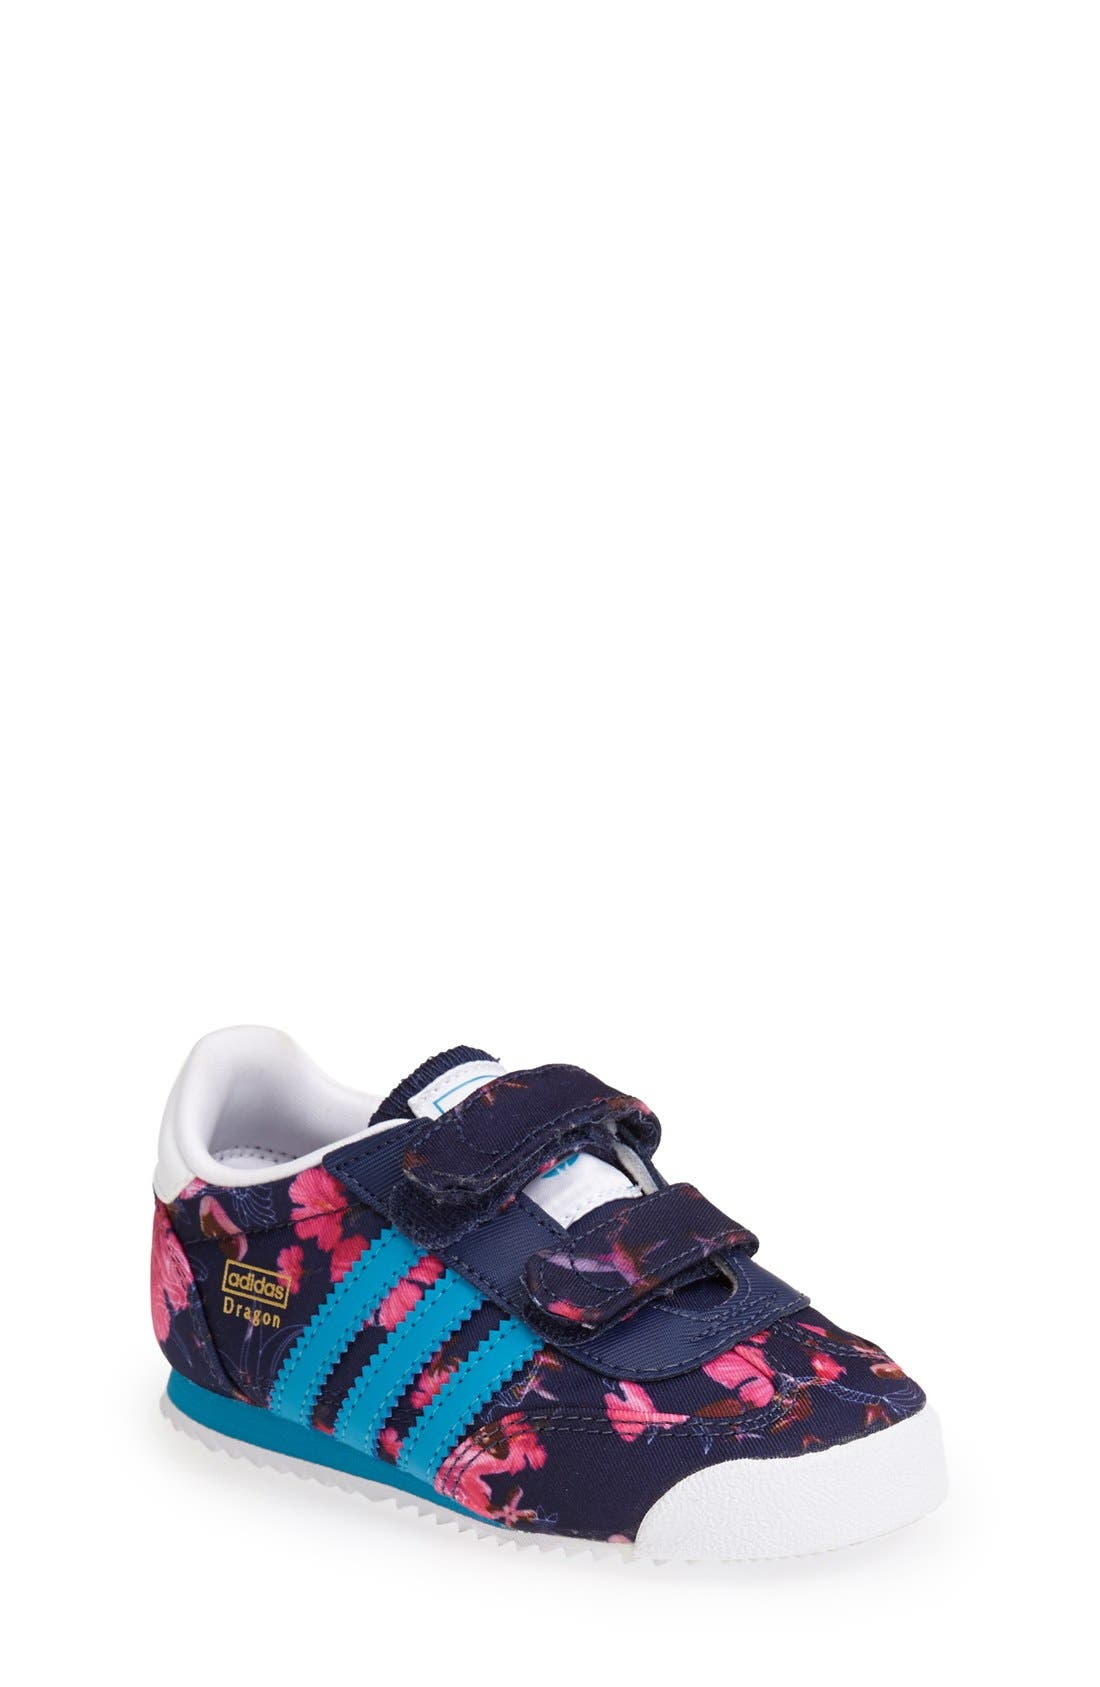 'Dragon - Floral' Sneaker, Main, color, 100